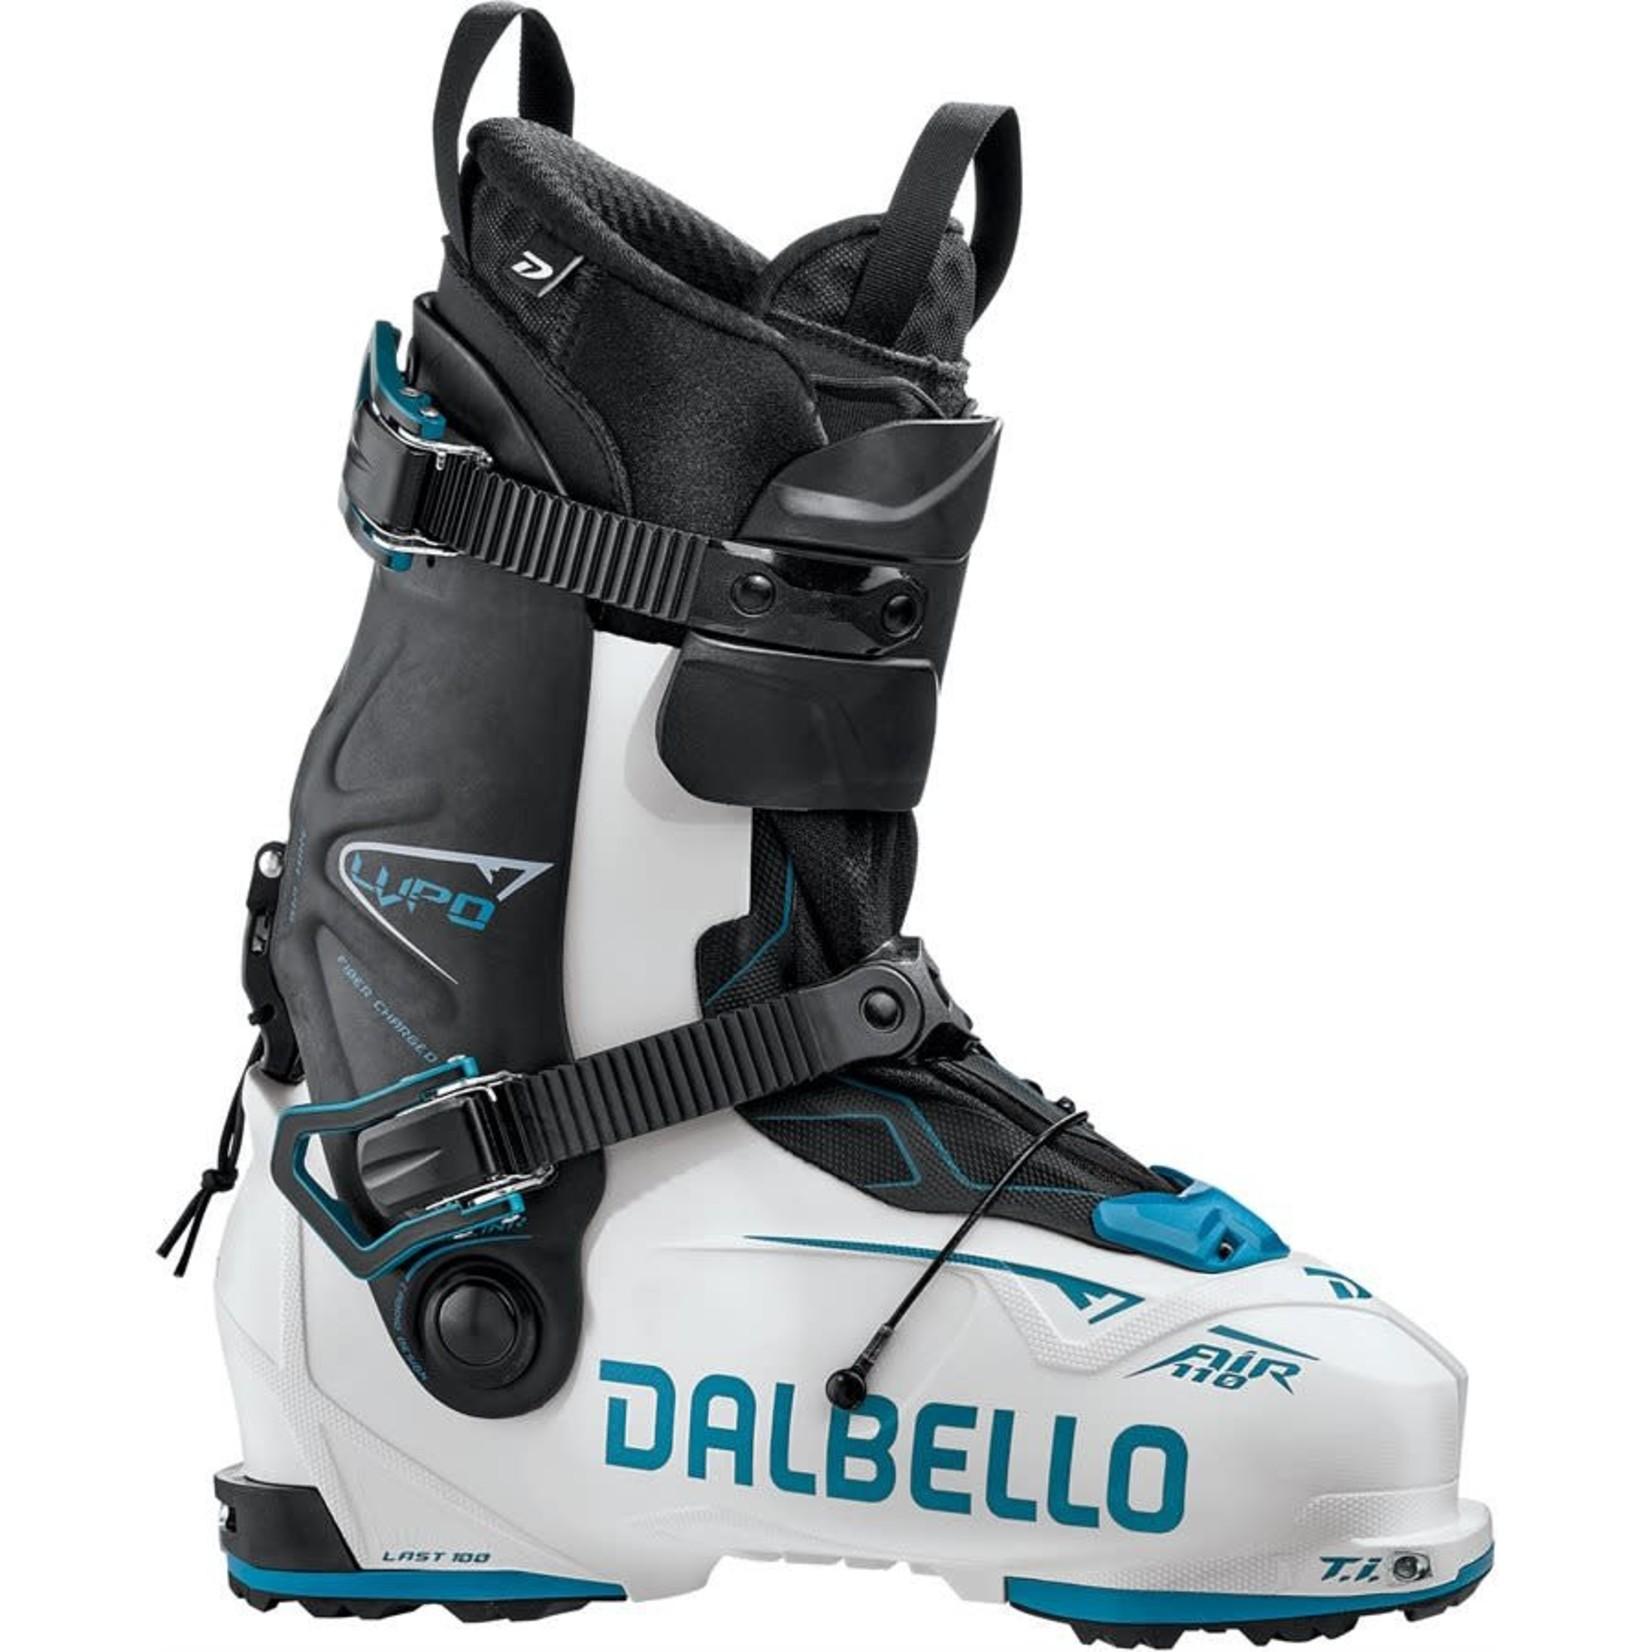 Botte de Ski Dalbello Lupo Air 110